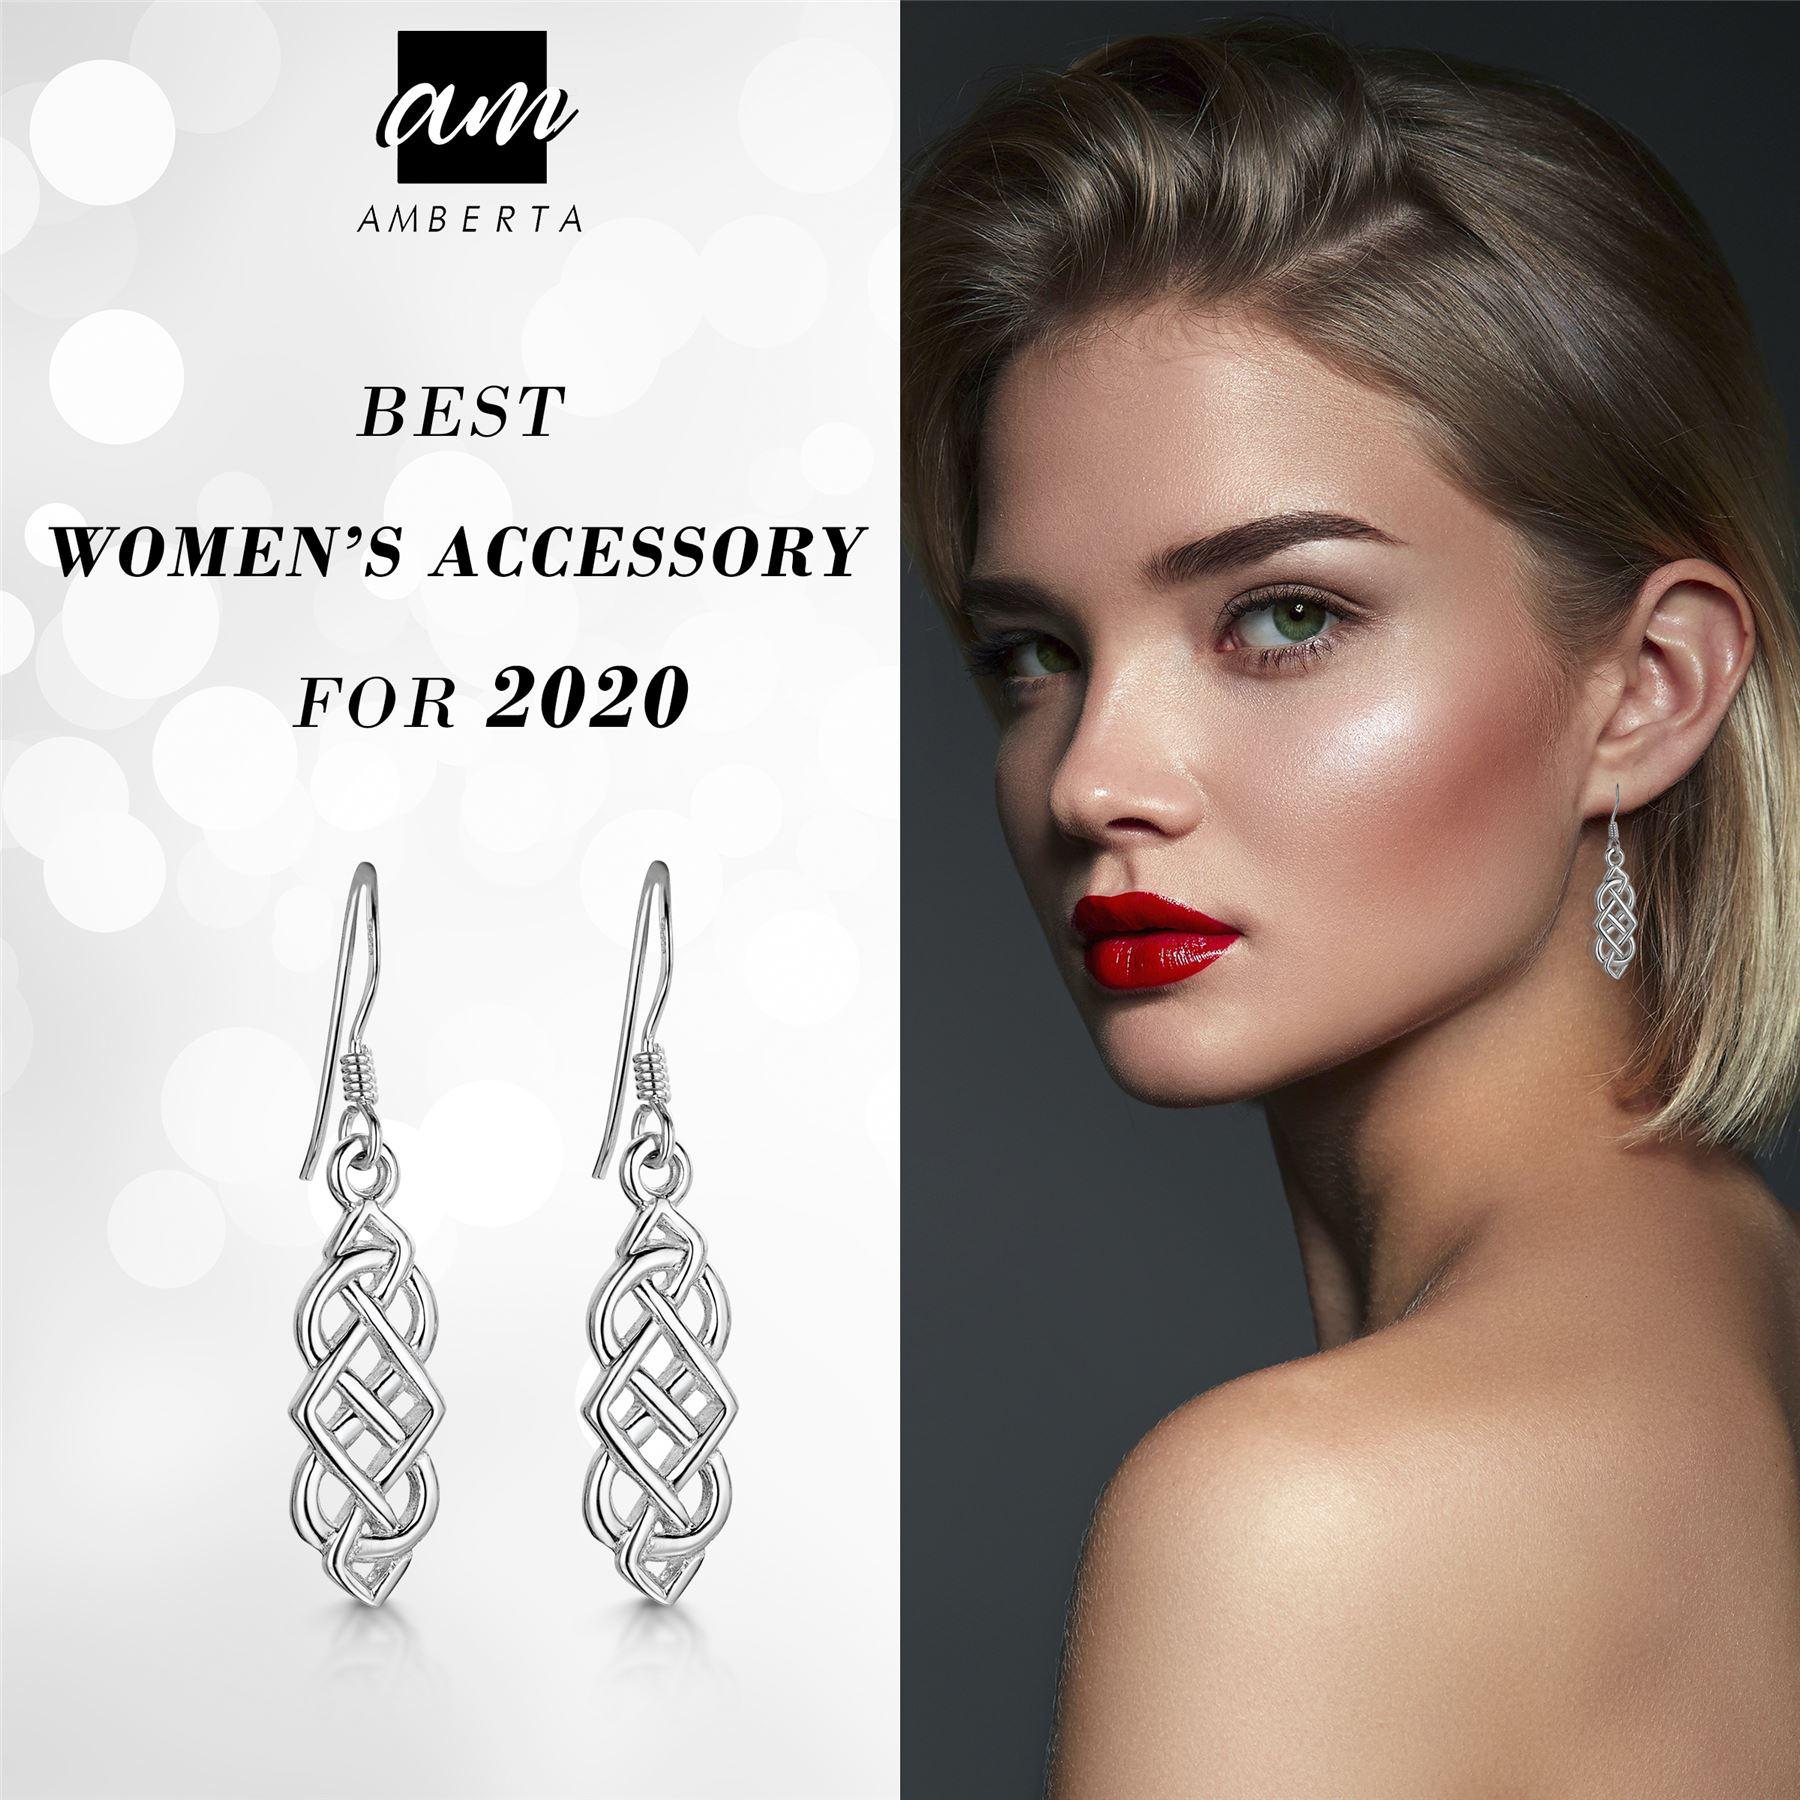 Amberta-925-Sterling-Silver-Celtic-Knot-Earrings-for-Women-Irish-Design miniature 30